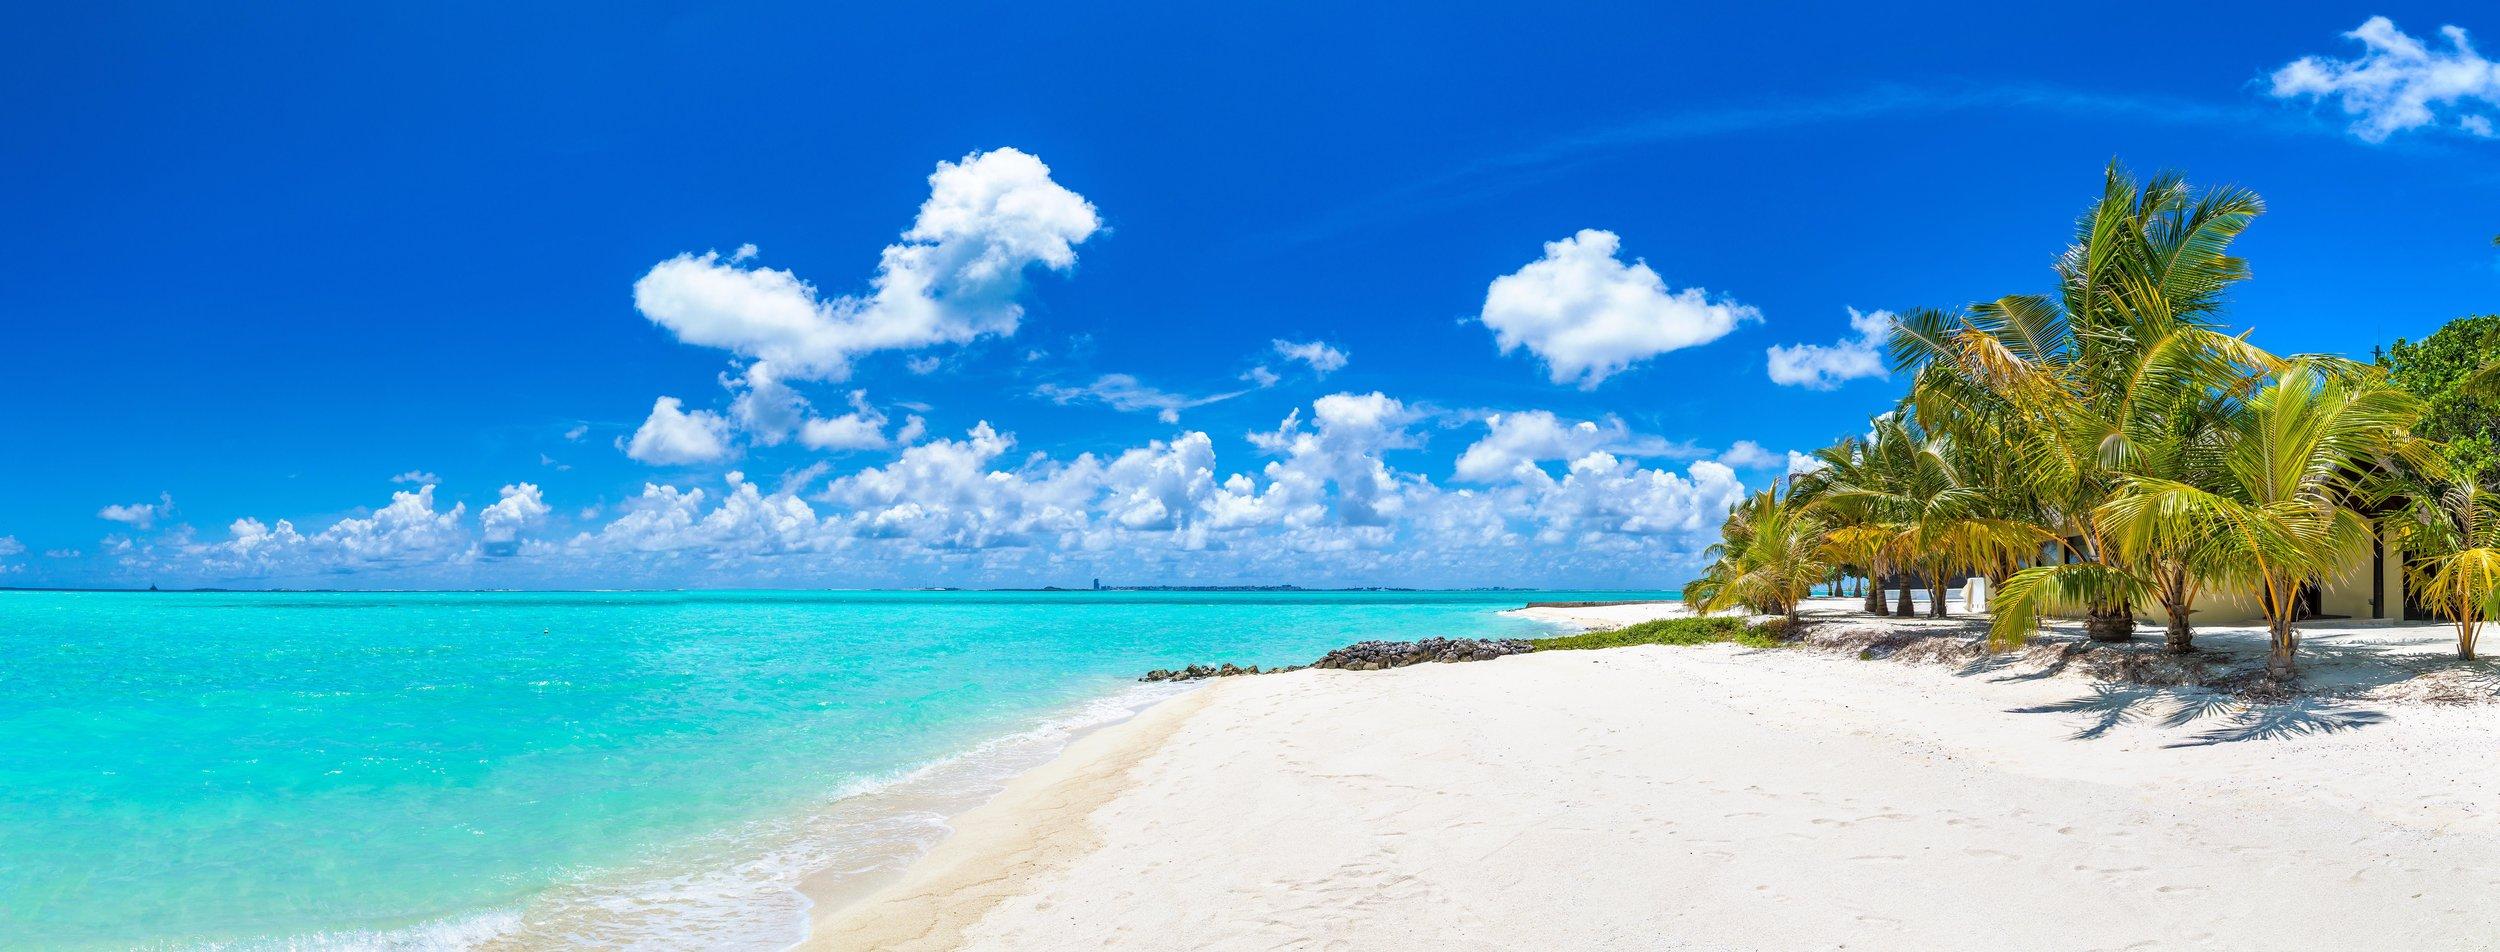 beach_scene2.jpg